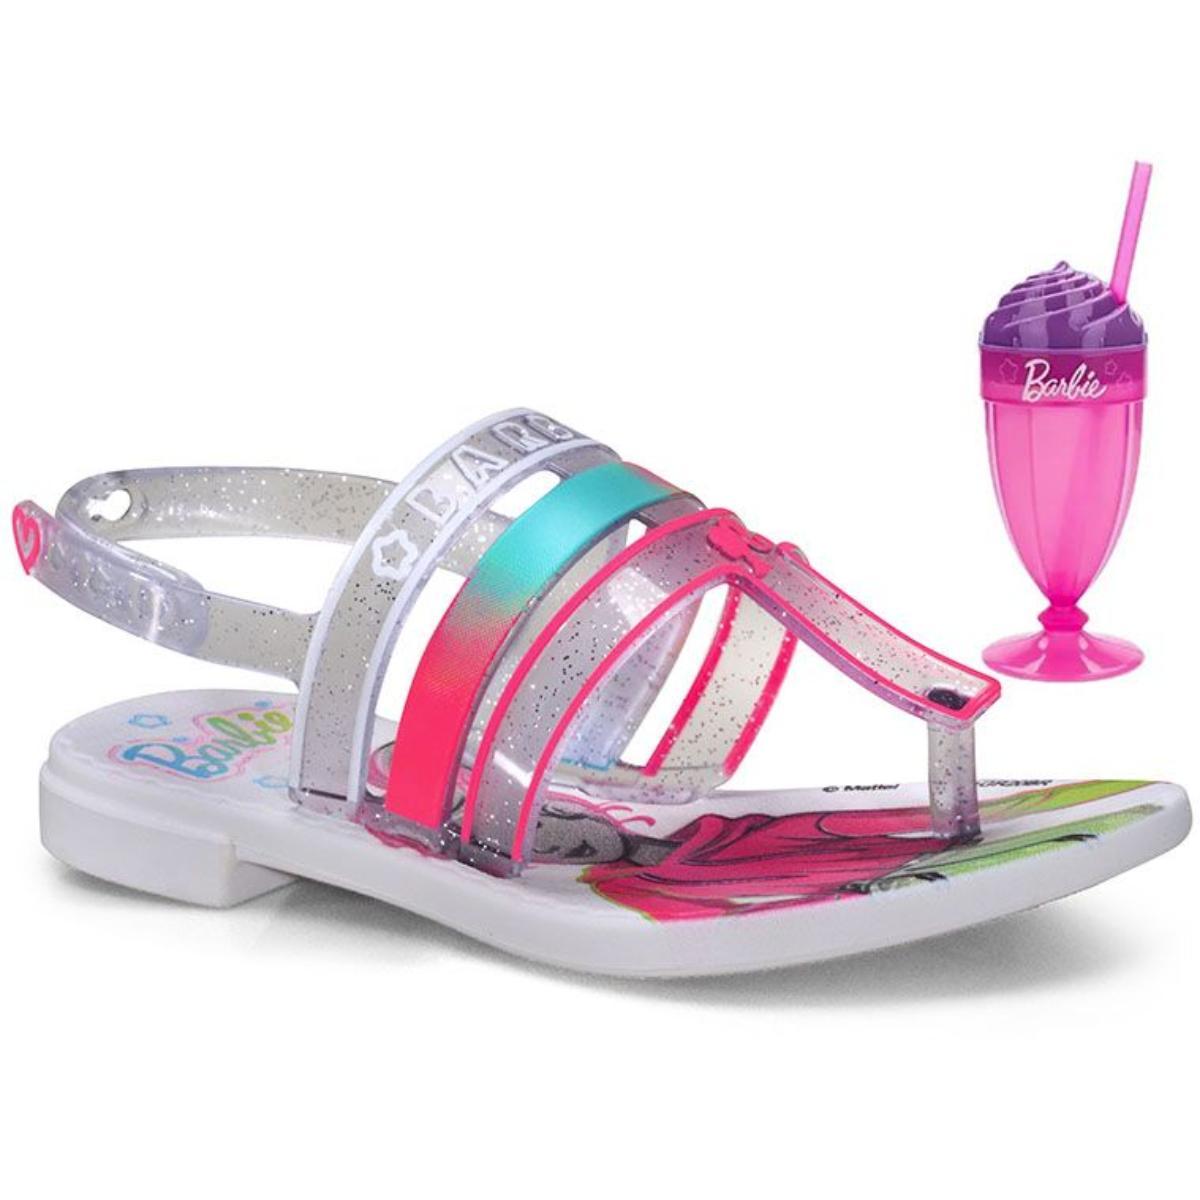 Sandália Fem Infantil Grendene 22460 21784 Milkshake Branco/vidro/rosa